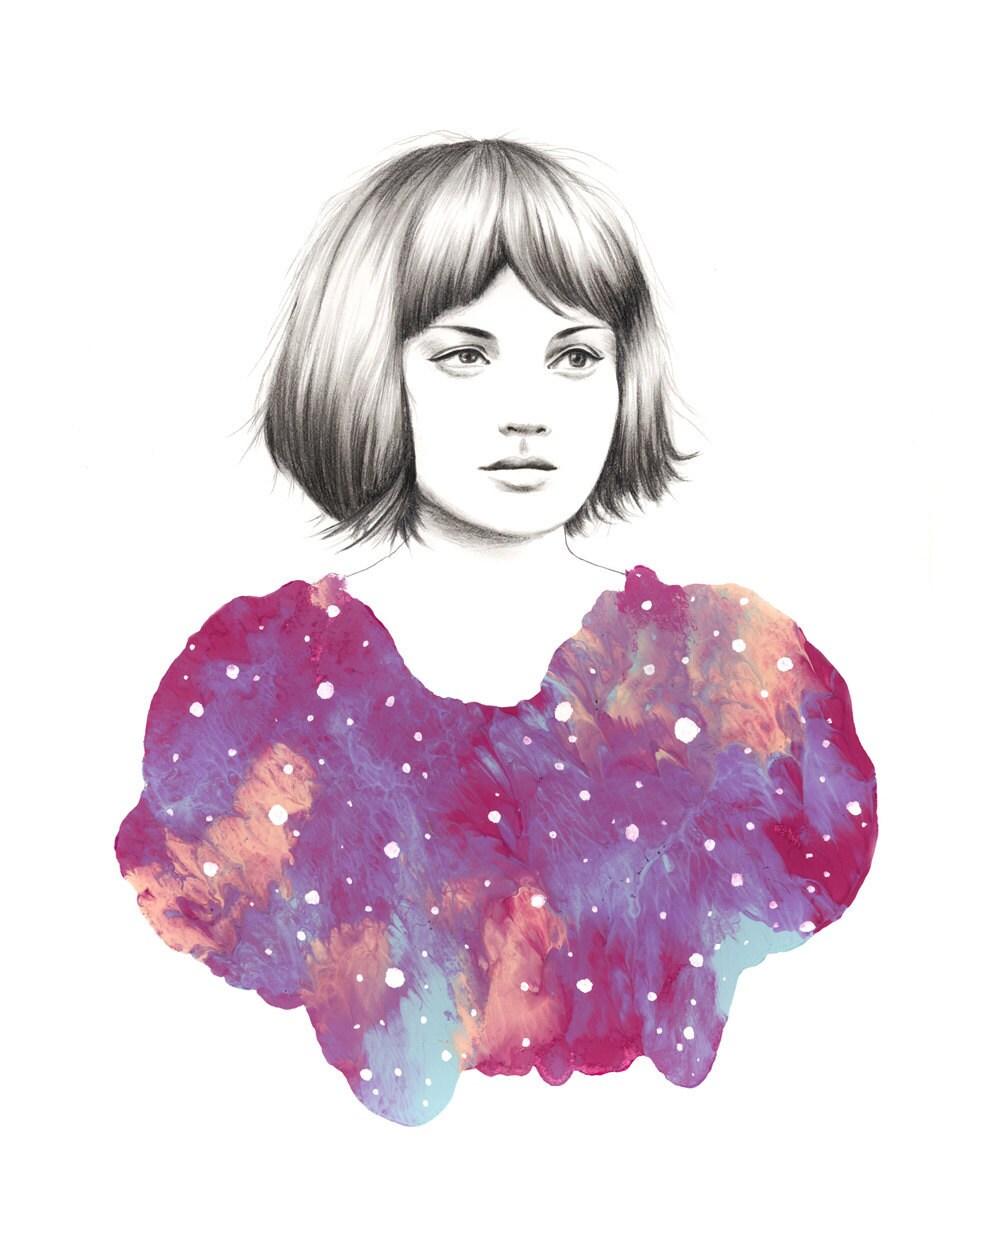 Artist Amanda Mocci